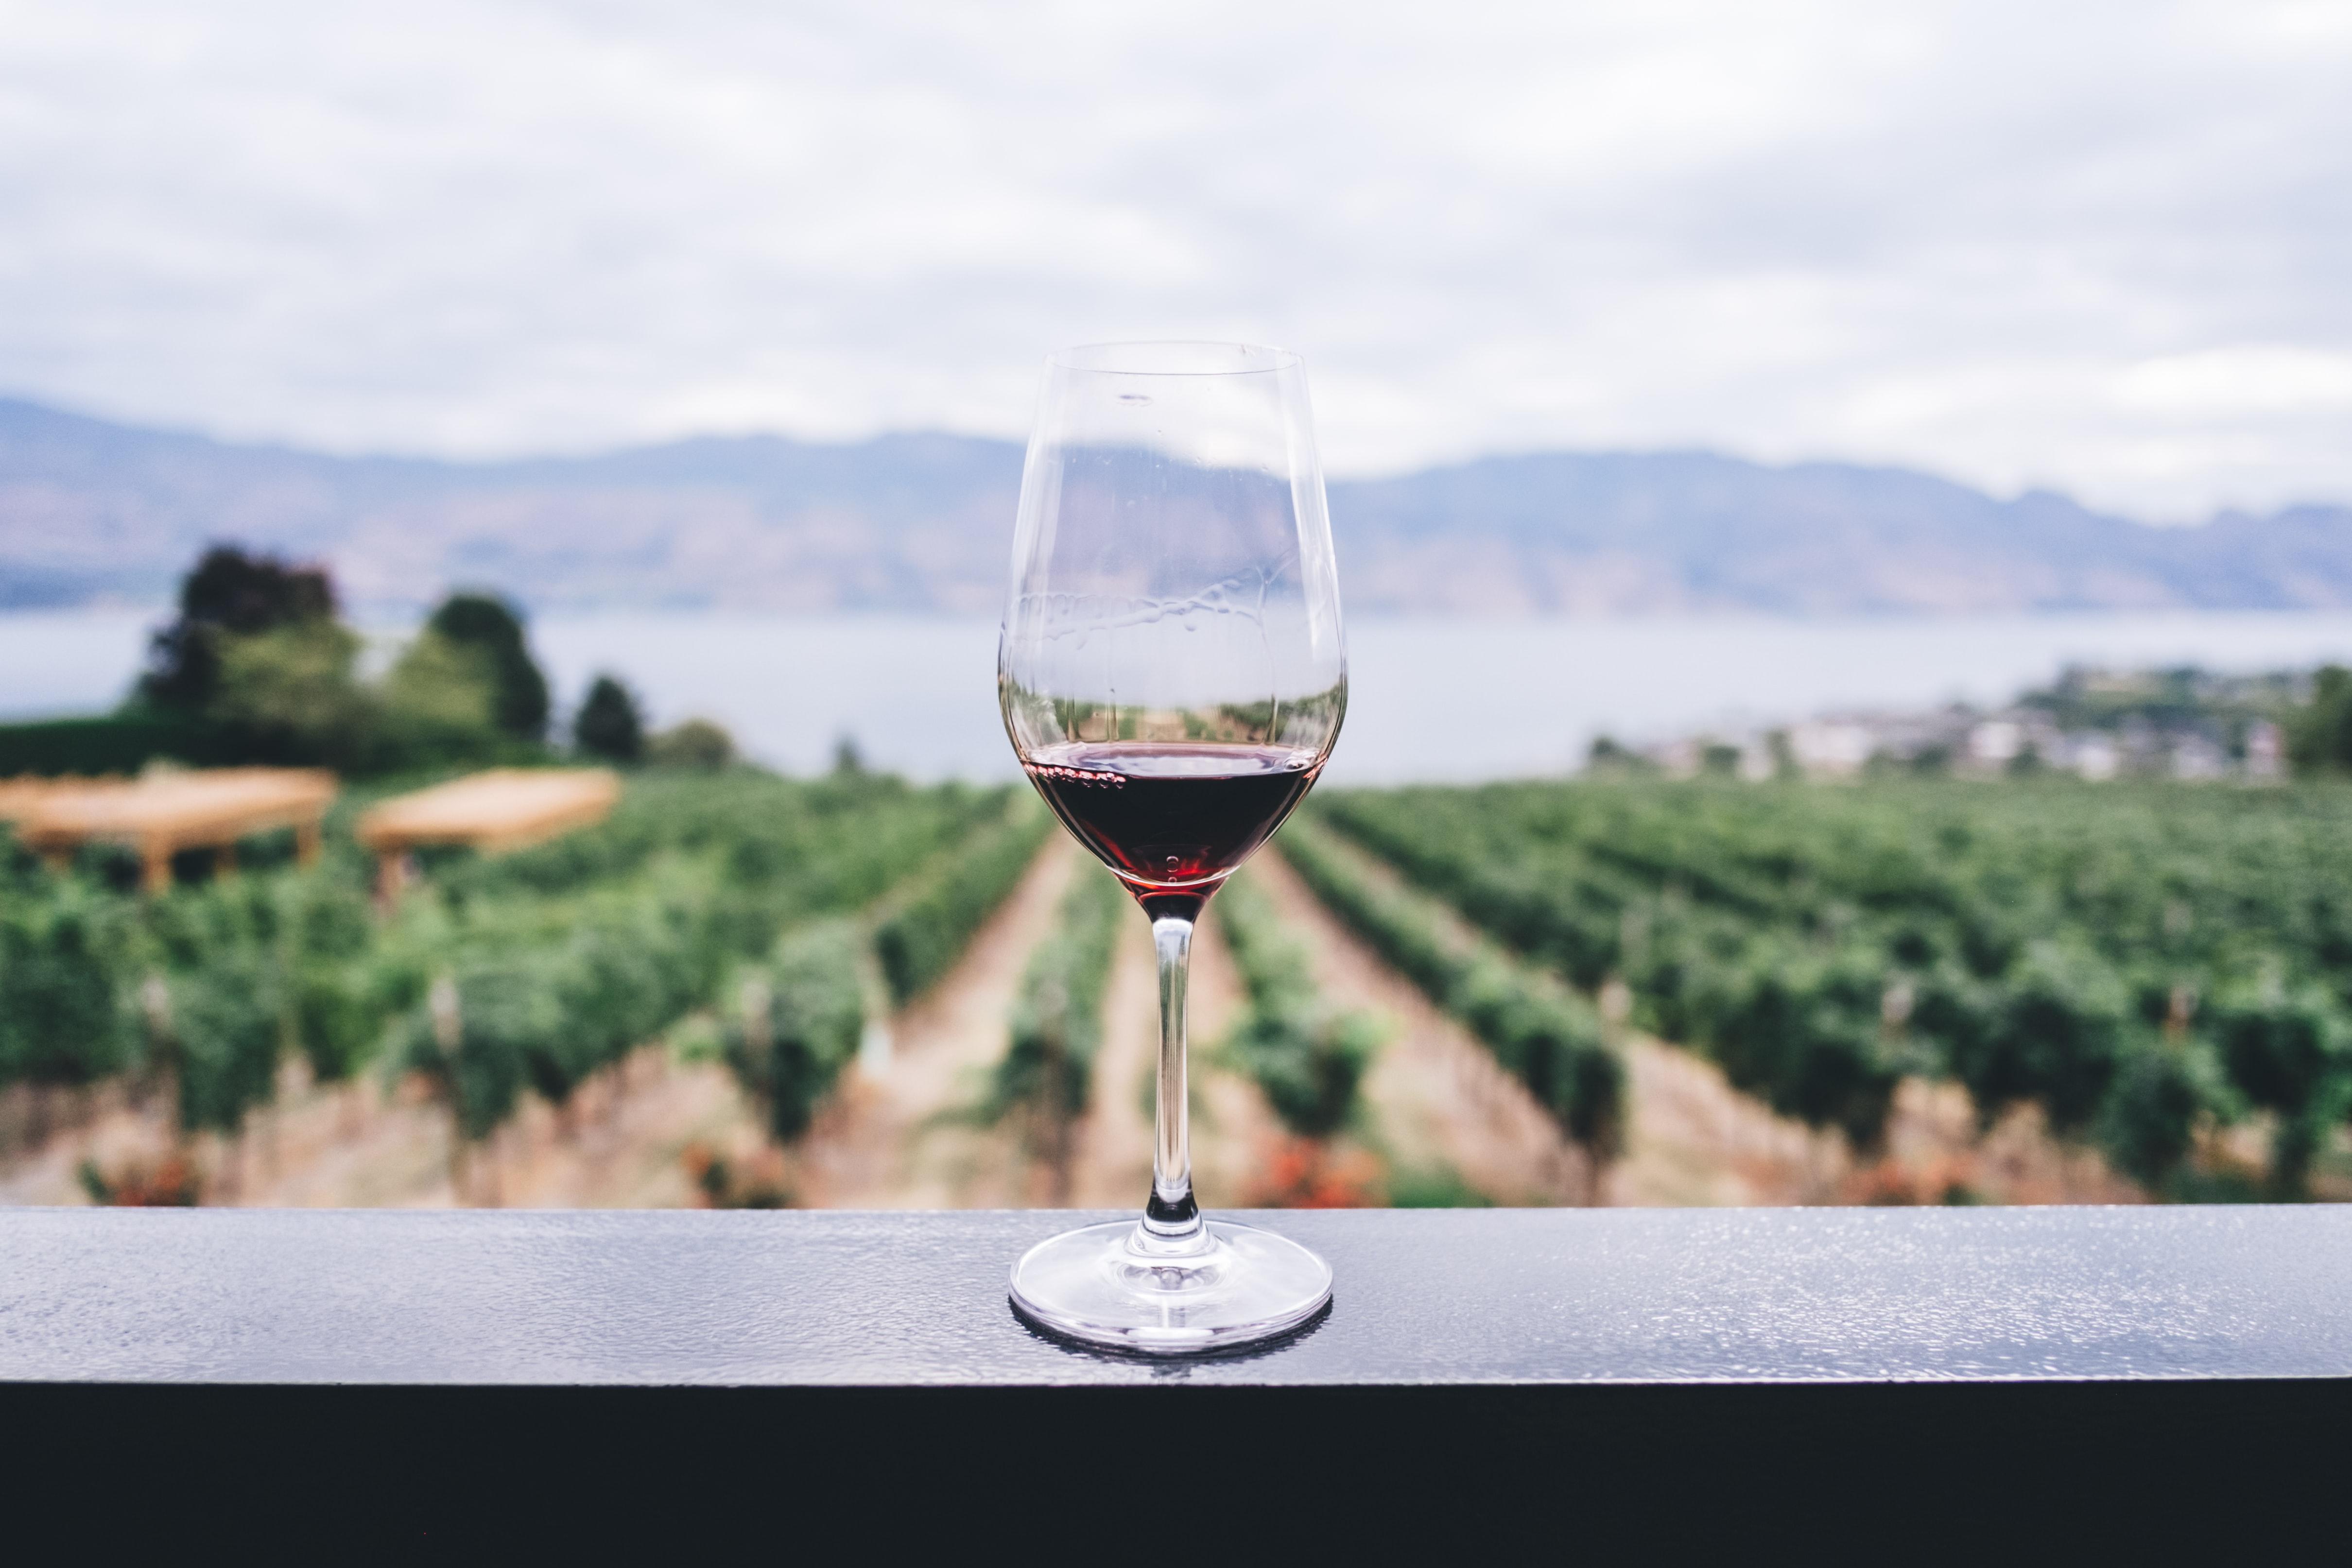 pinot noir winery image https://unsplash.com/photos/aF1NPSnDQLw